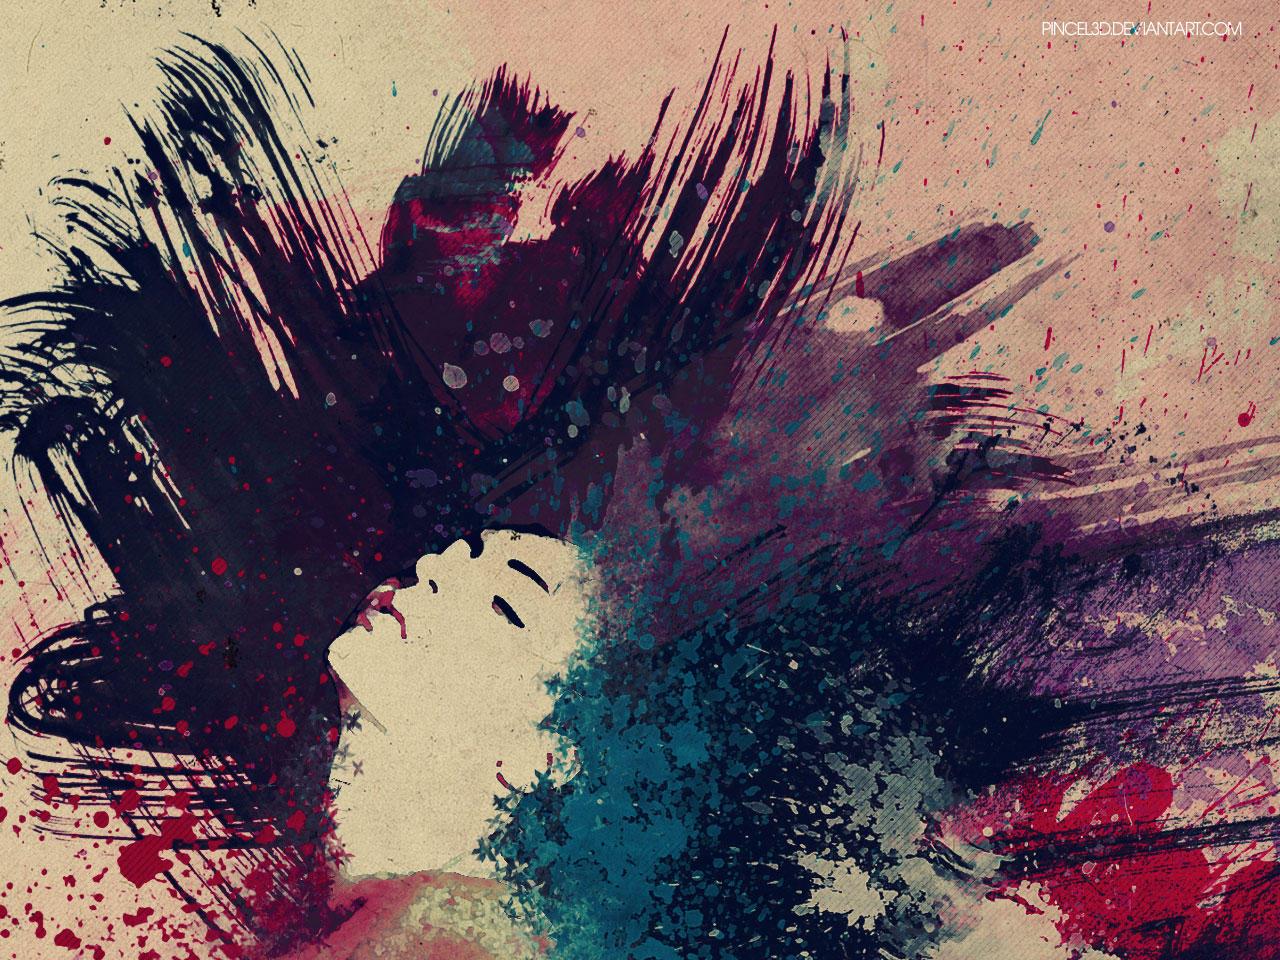 Passion  Wallpaper By Pincel3d On Deviantart